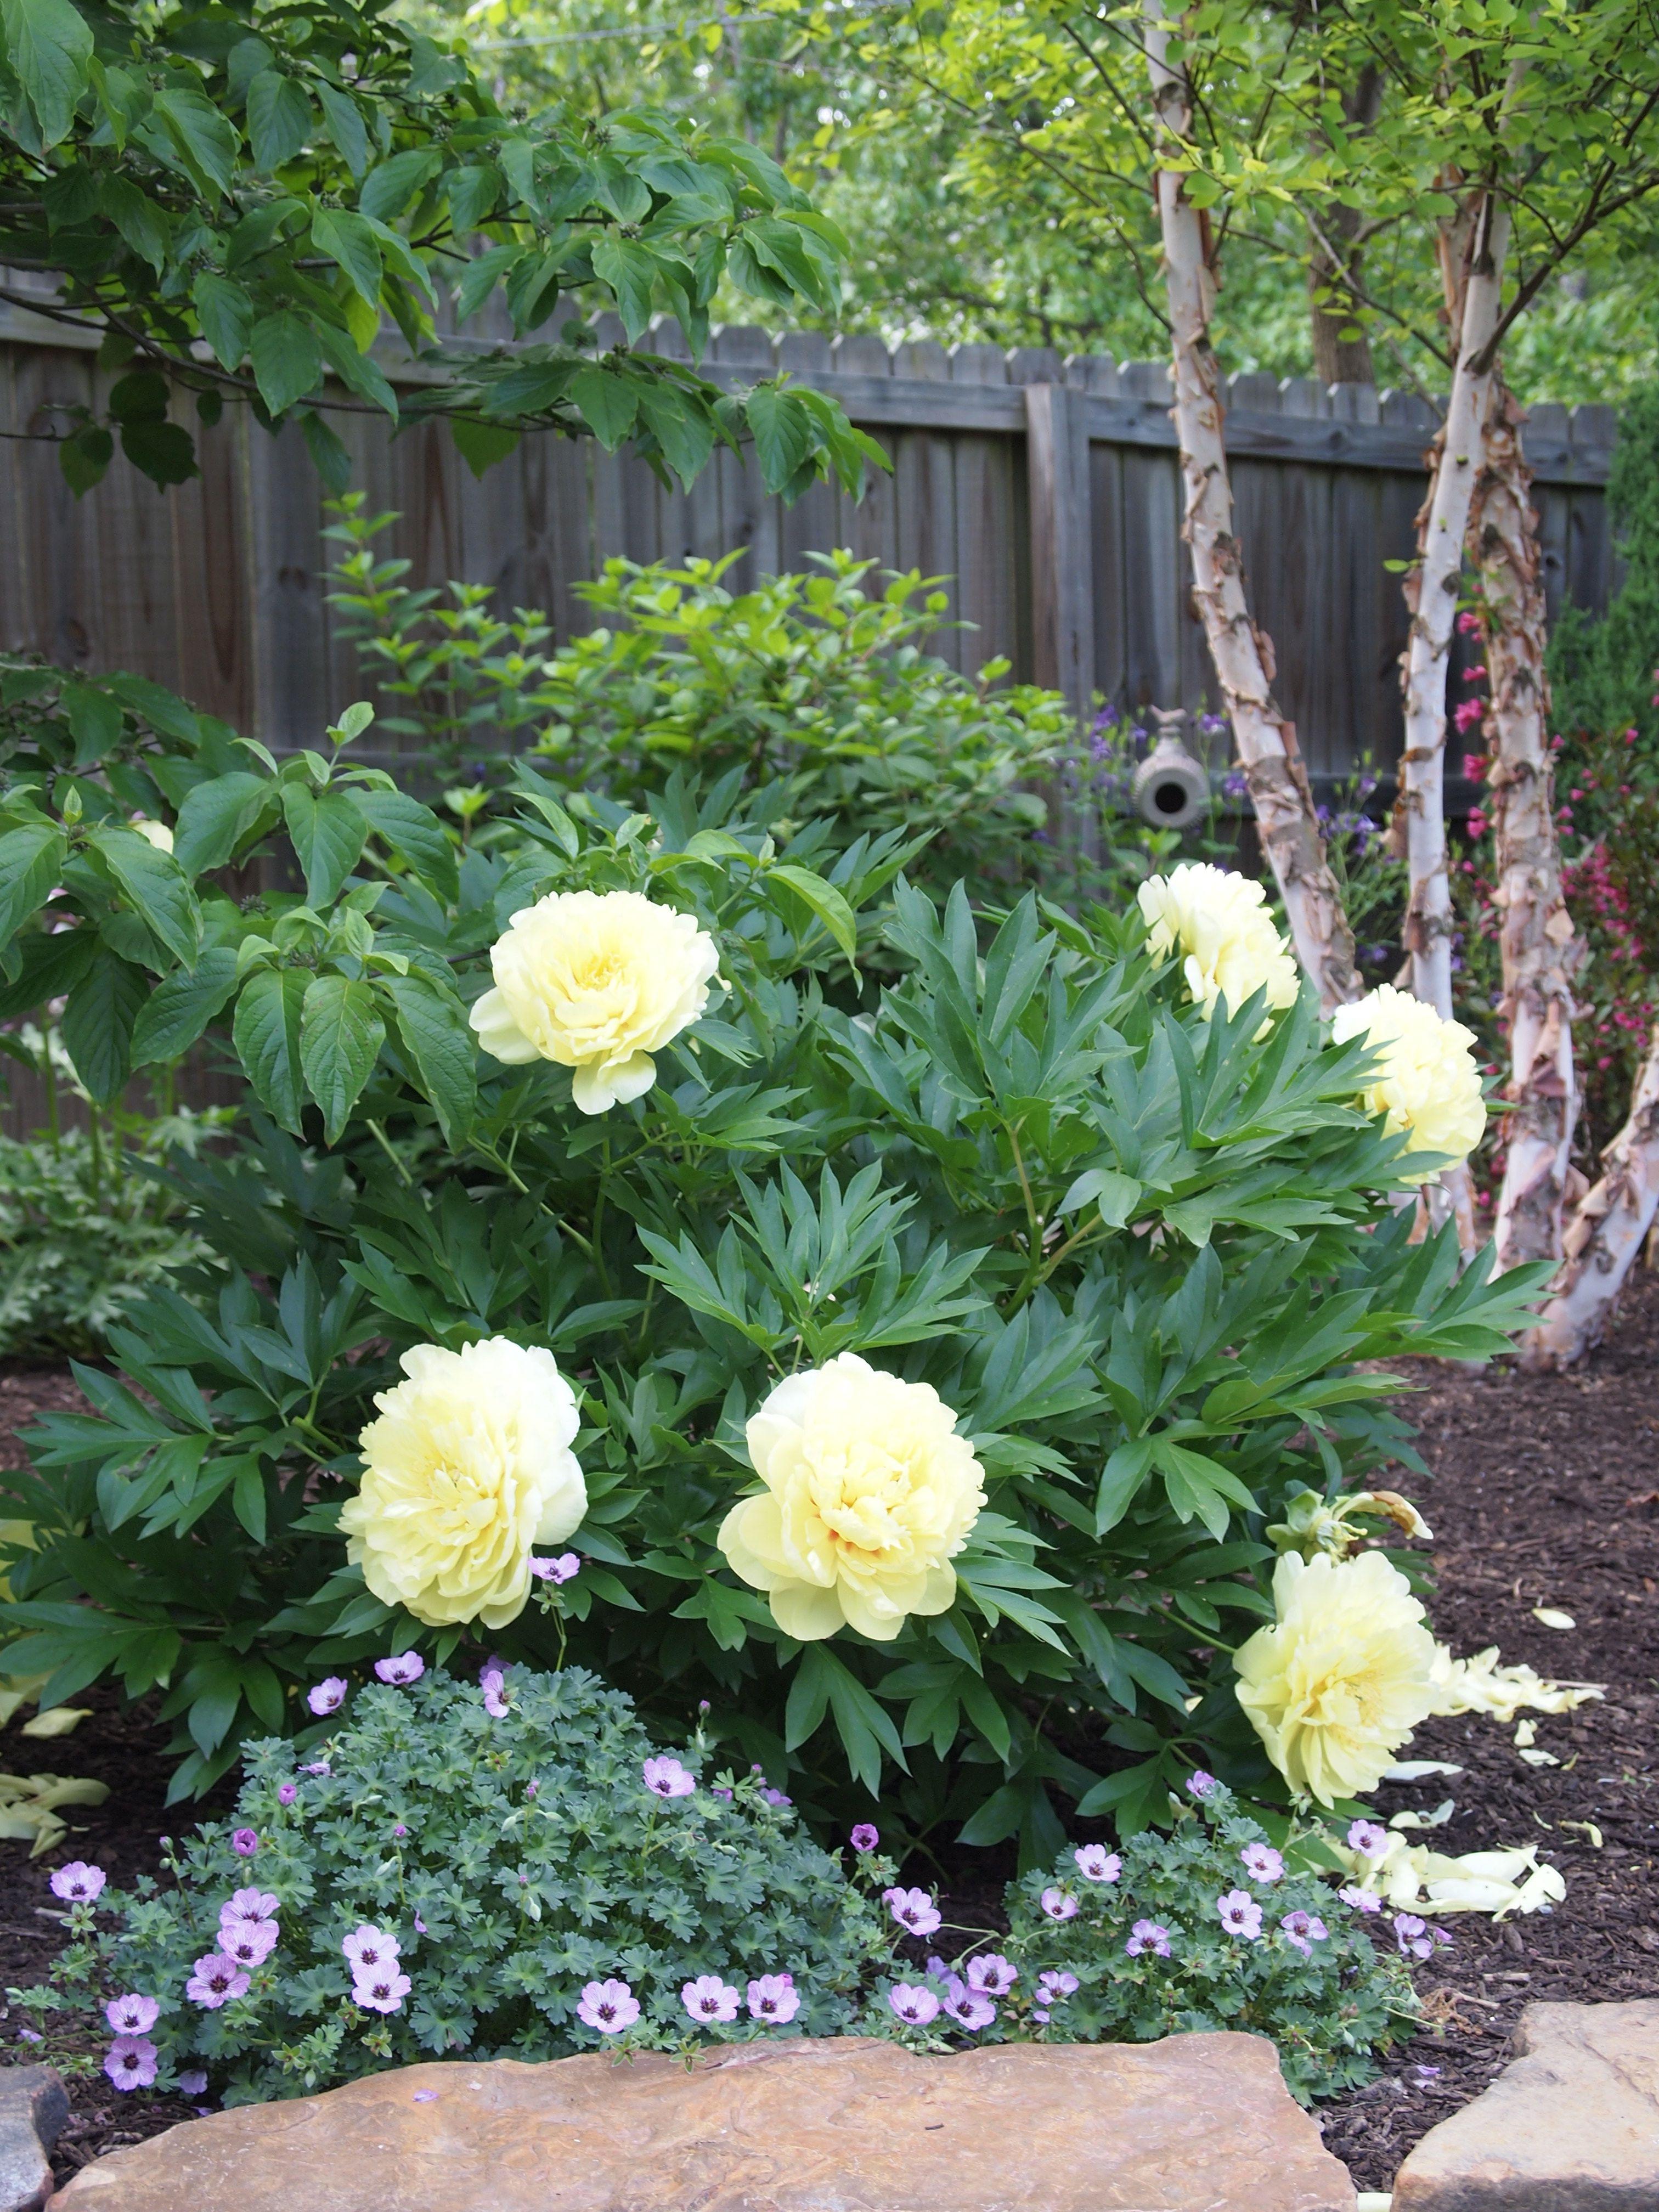 Bartzella Peony With Ballerina Hardy Geranium In Front Peonies Garden Planting Peonies Flowers Perennials